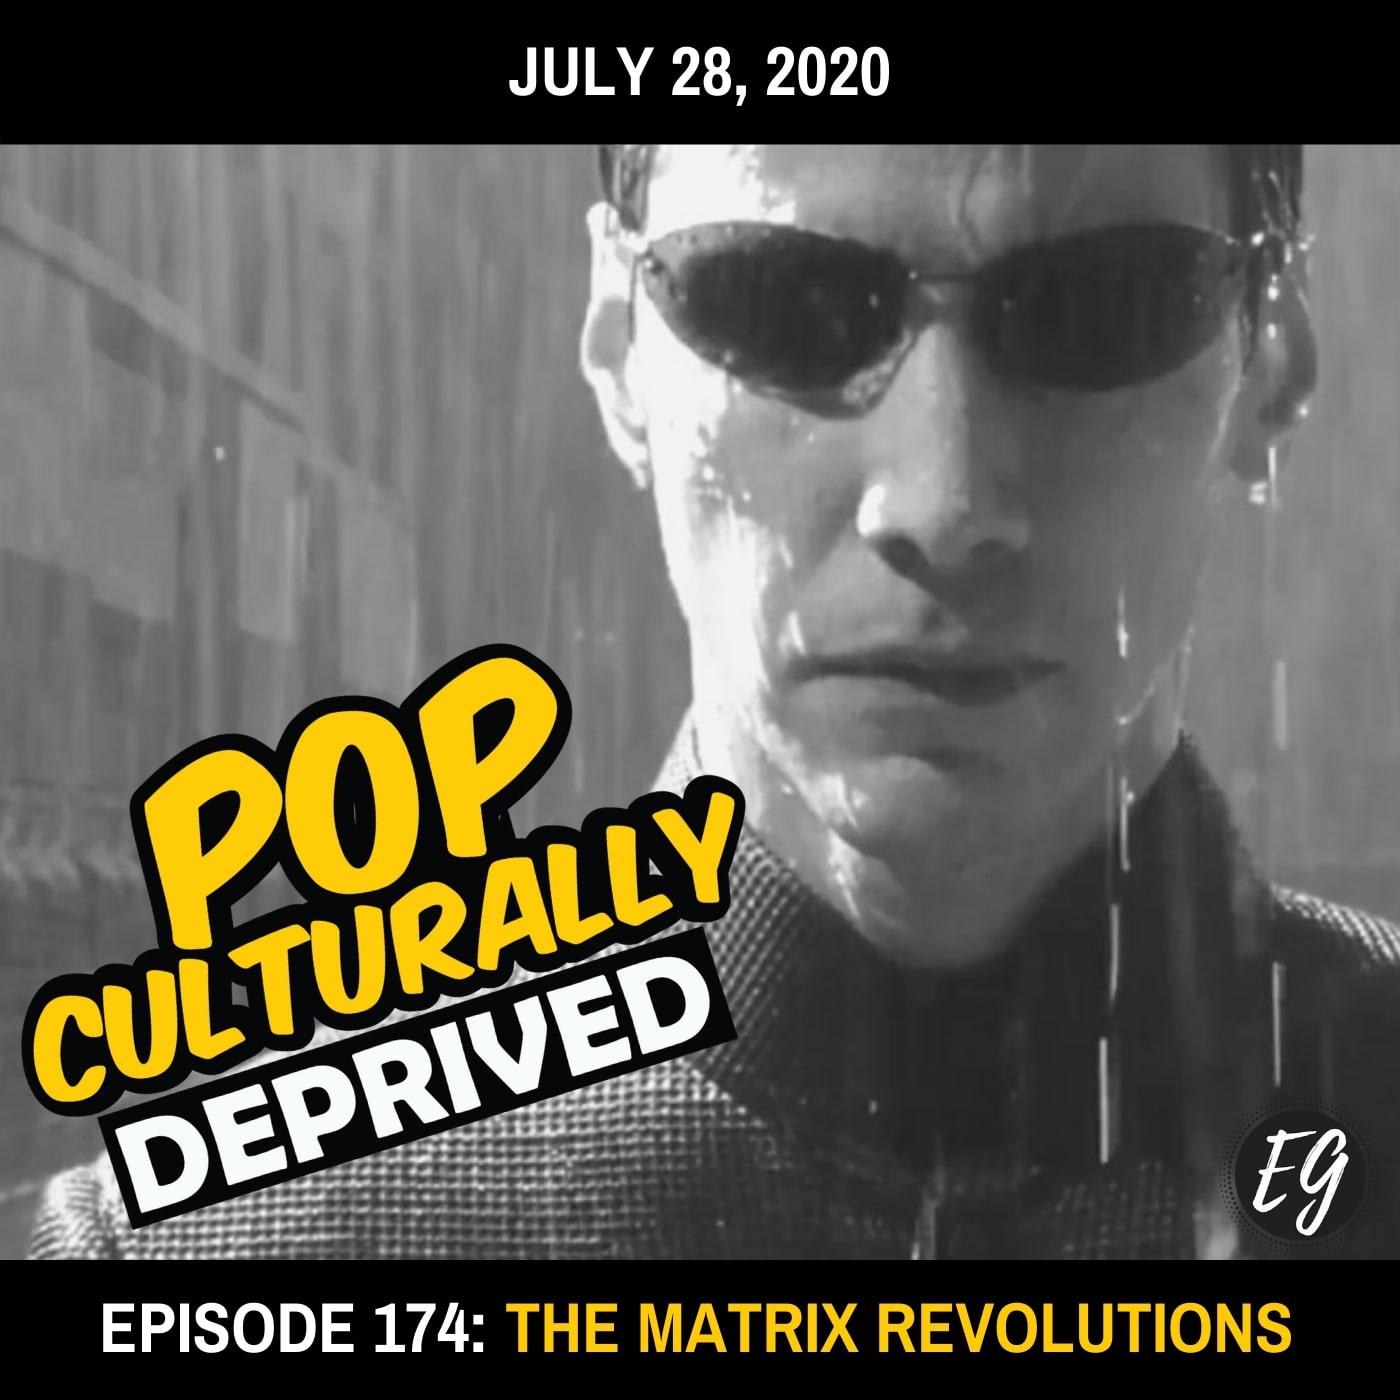 Episode 174: The Matrix Revolutions